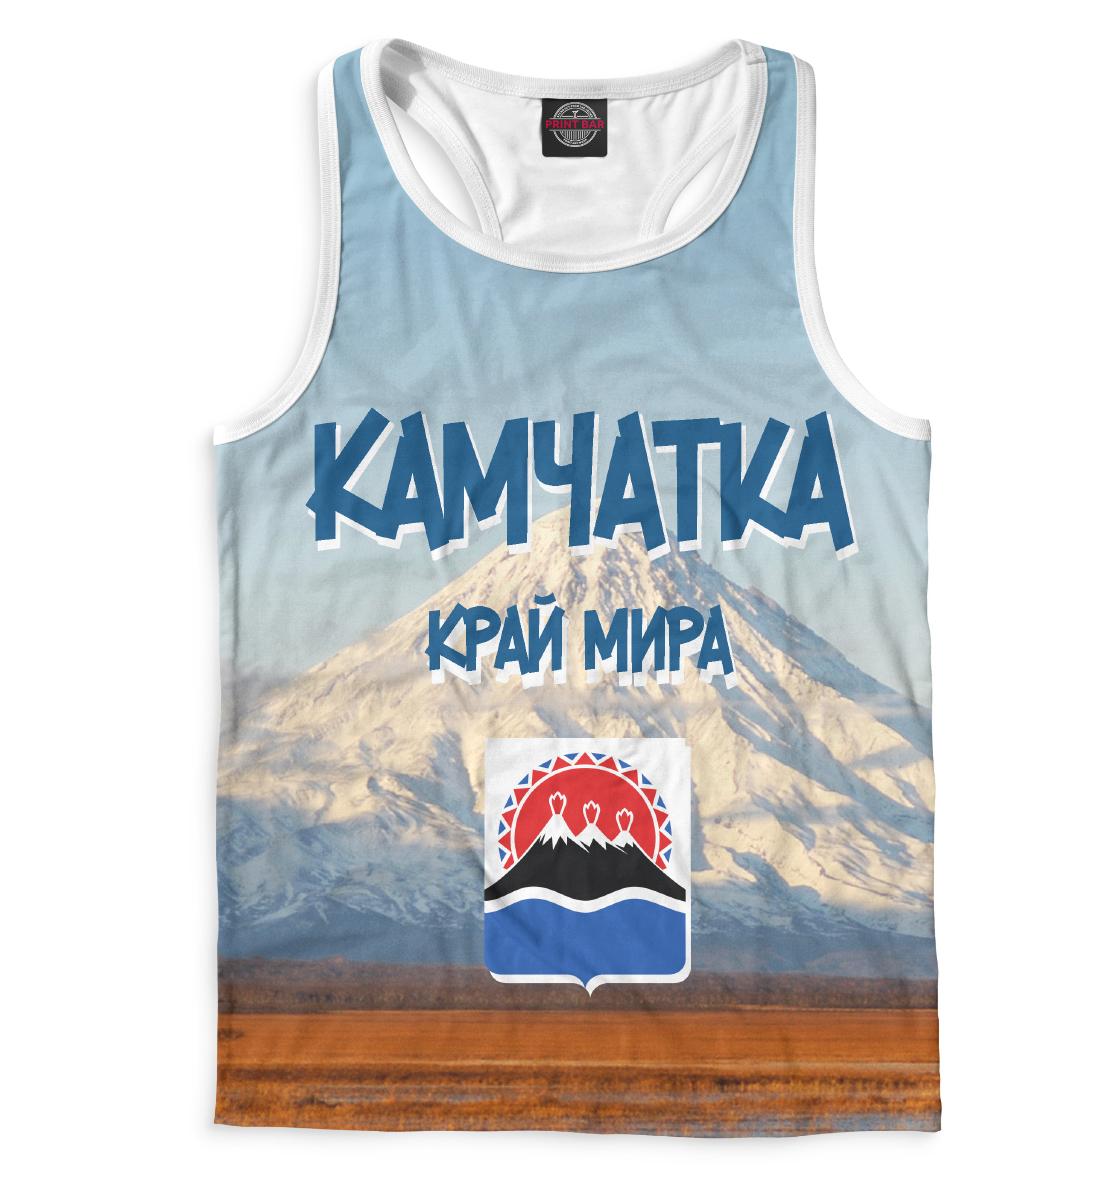 Купить Камчатка — край мира, Printbar, Майки борцовки, KAM-759575-mayb-2